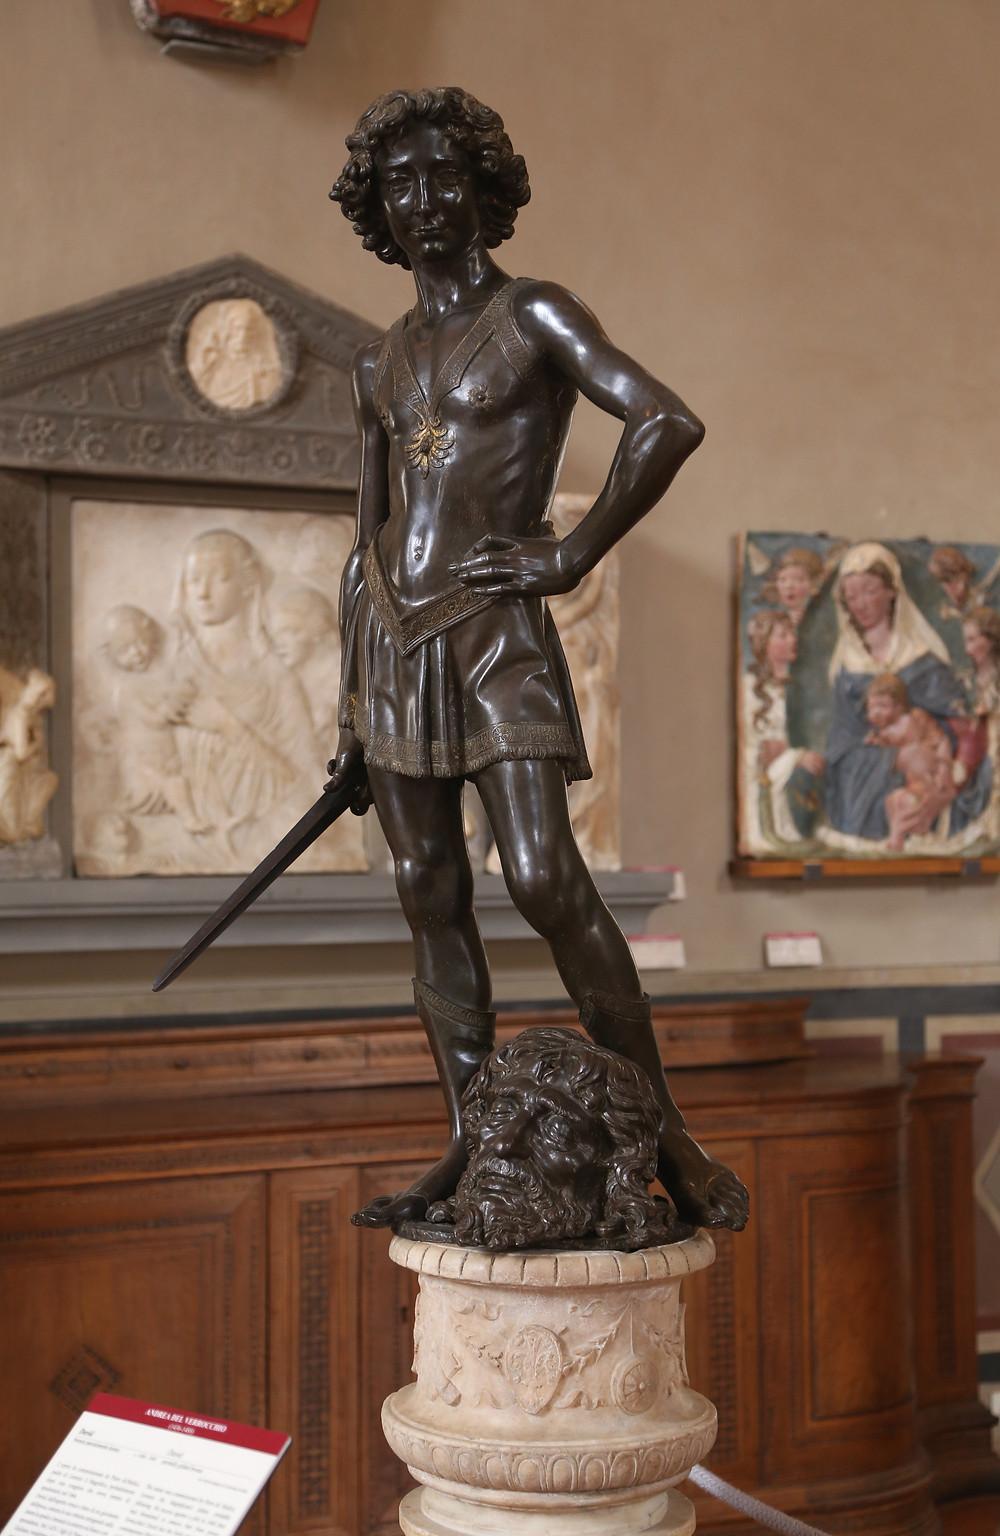 Verrochio, David, 1475, famous sculpture in Florence's Bargello Museum